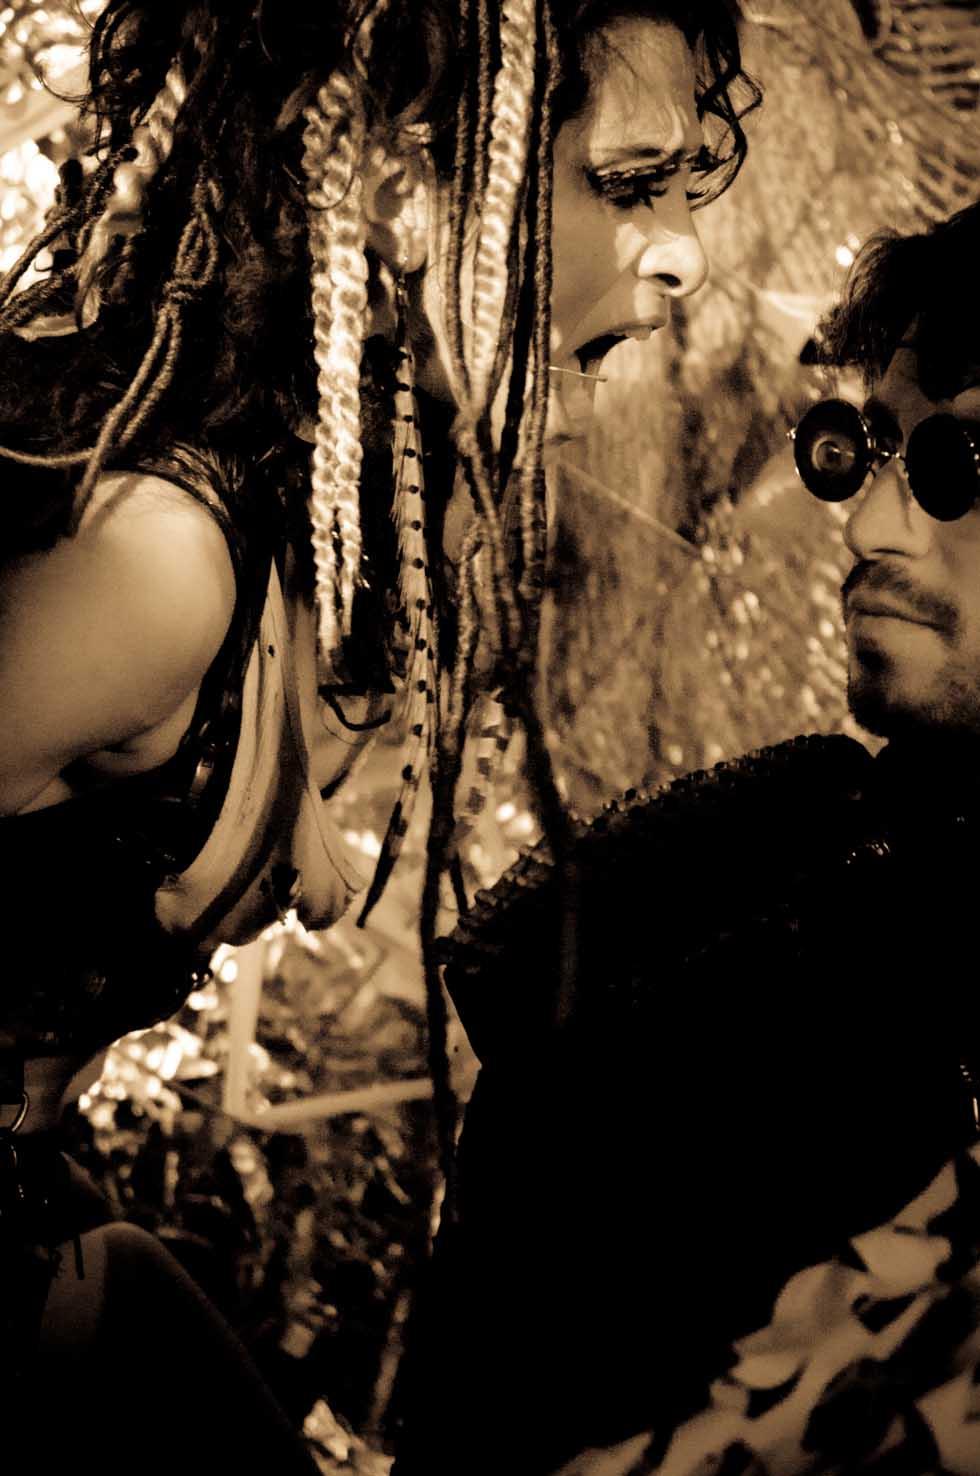 zum-schneider-nyc-2012-karneval-apocalyptika-3401.jpg